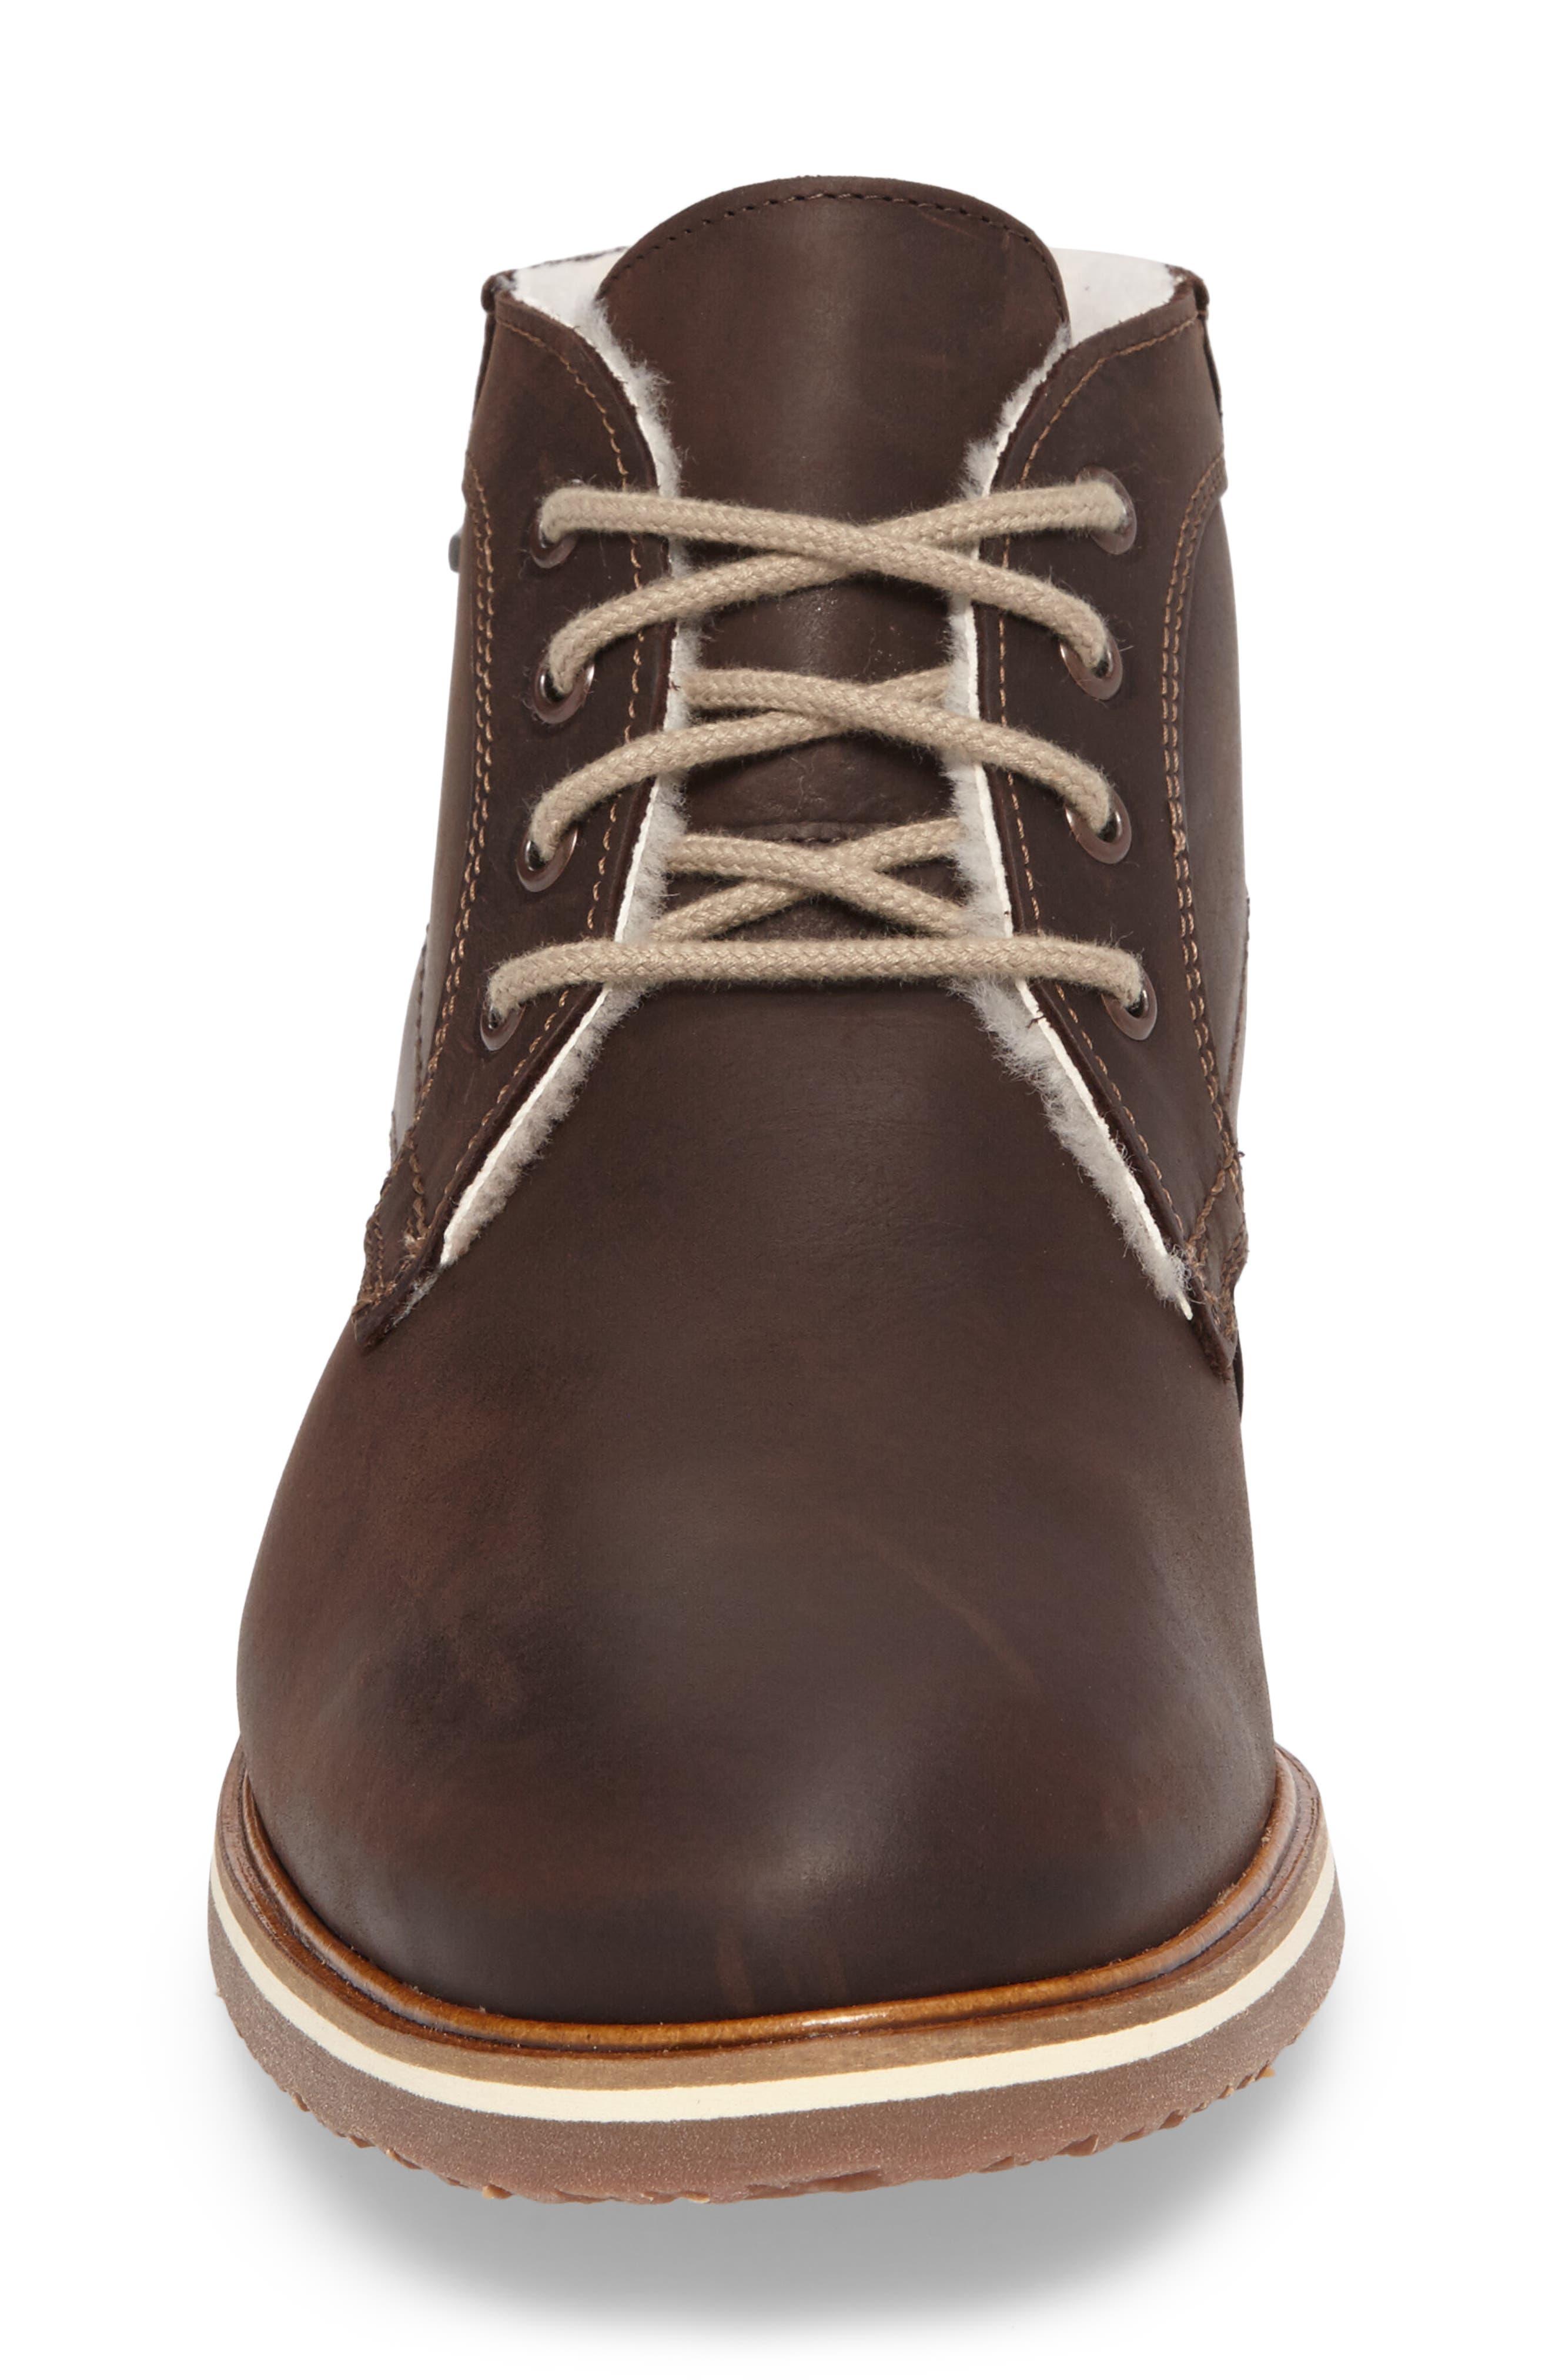 Varus Waterproof Shearlng Lined Chukka Boot,                             Alternate thumbnail 4, color,                             Ebony Leather